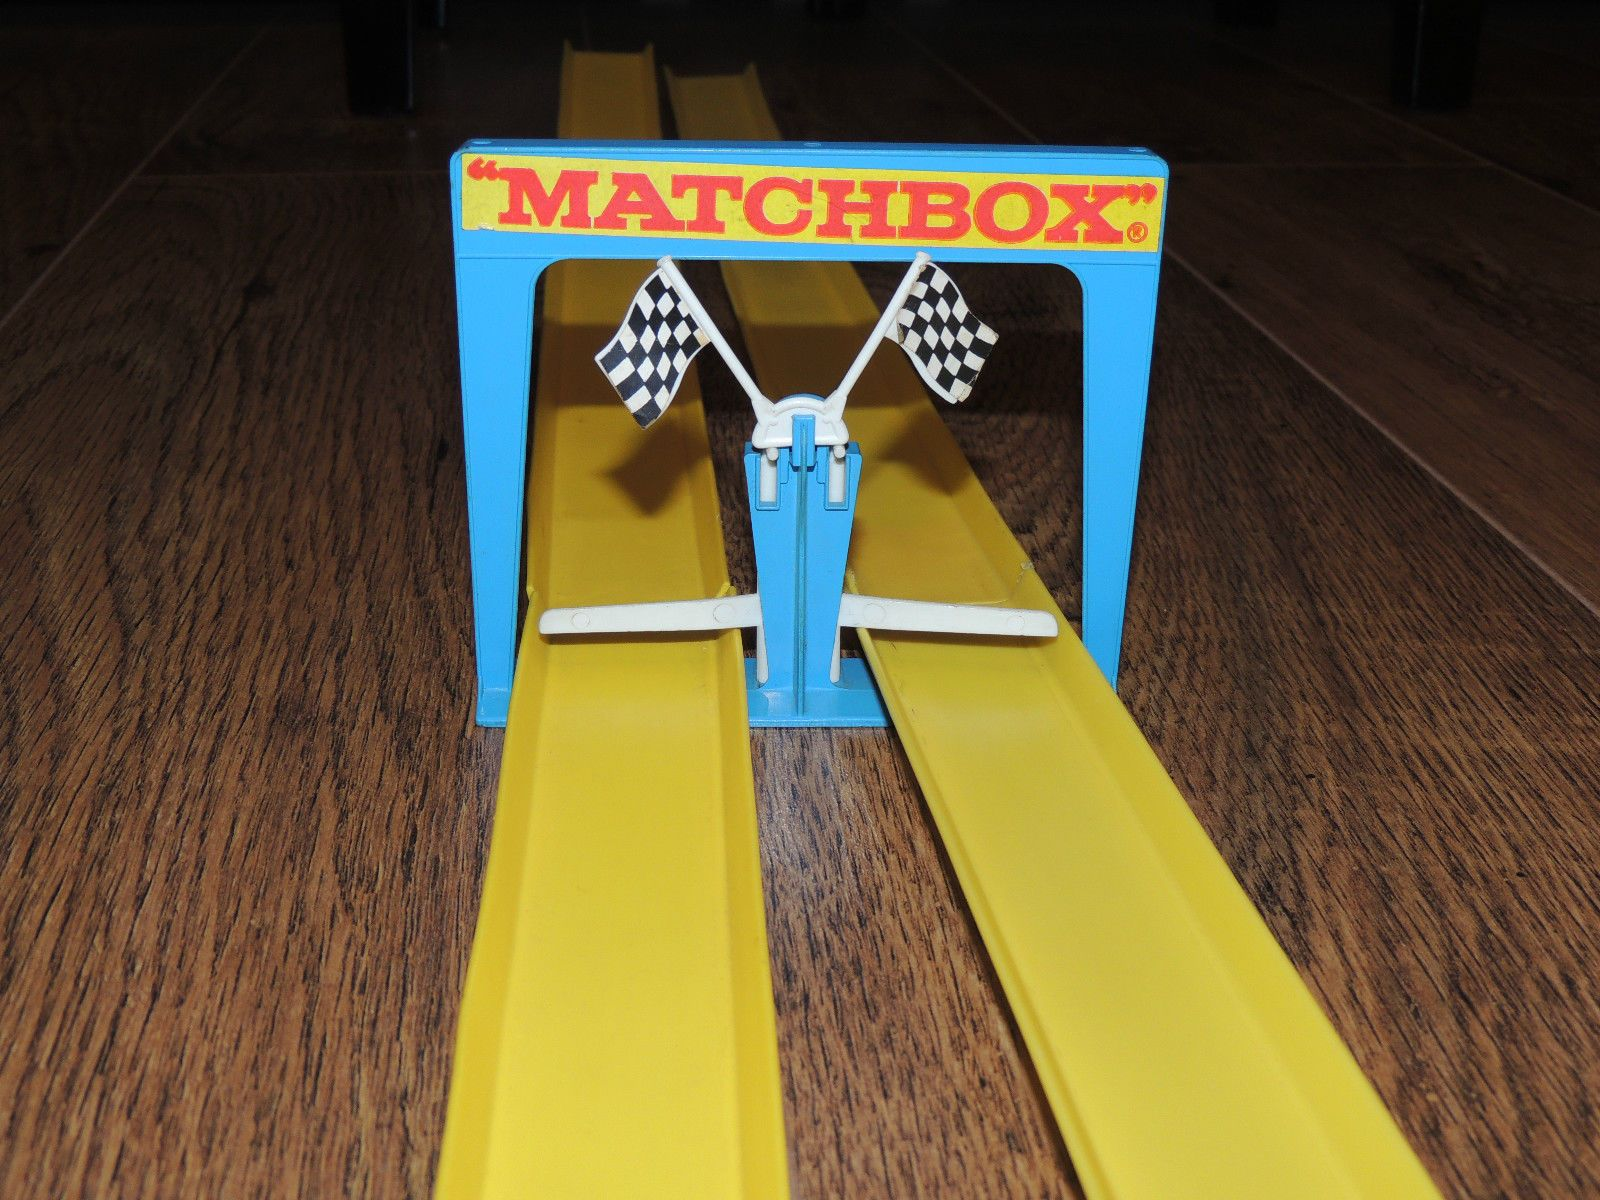 Finishing Line Of Matchbox Superfast Twin Loops Race Track Set Matchbox Childhood Memories Childhood Days